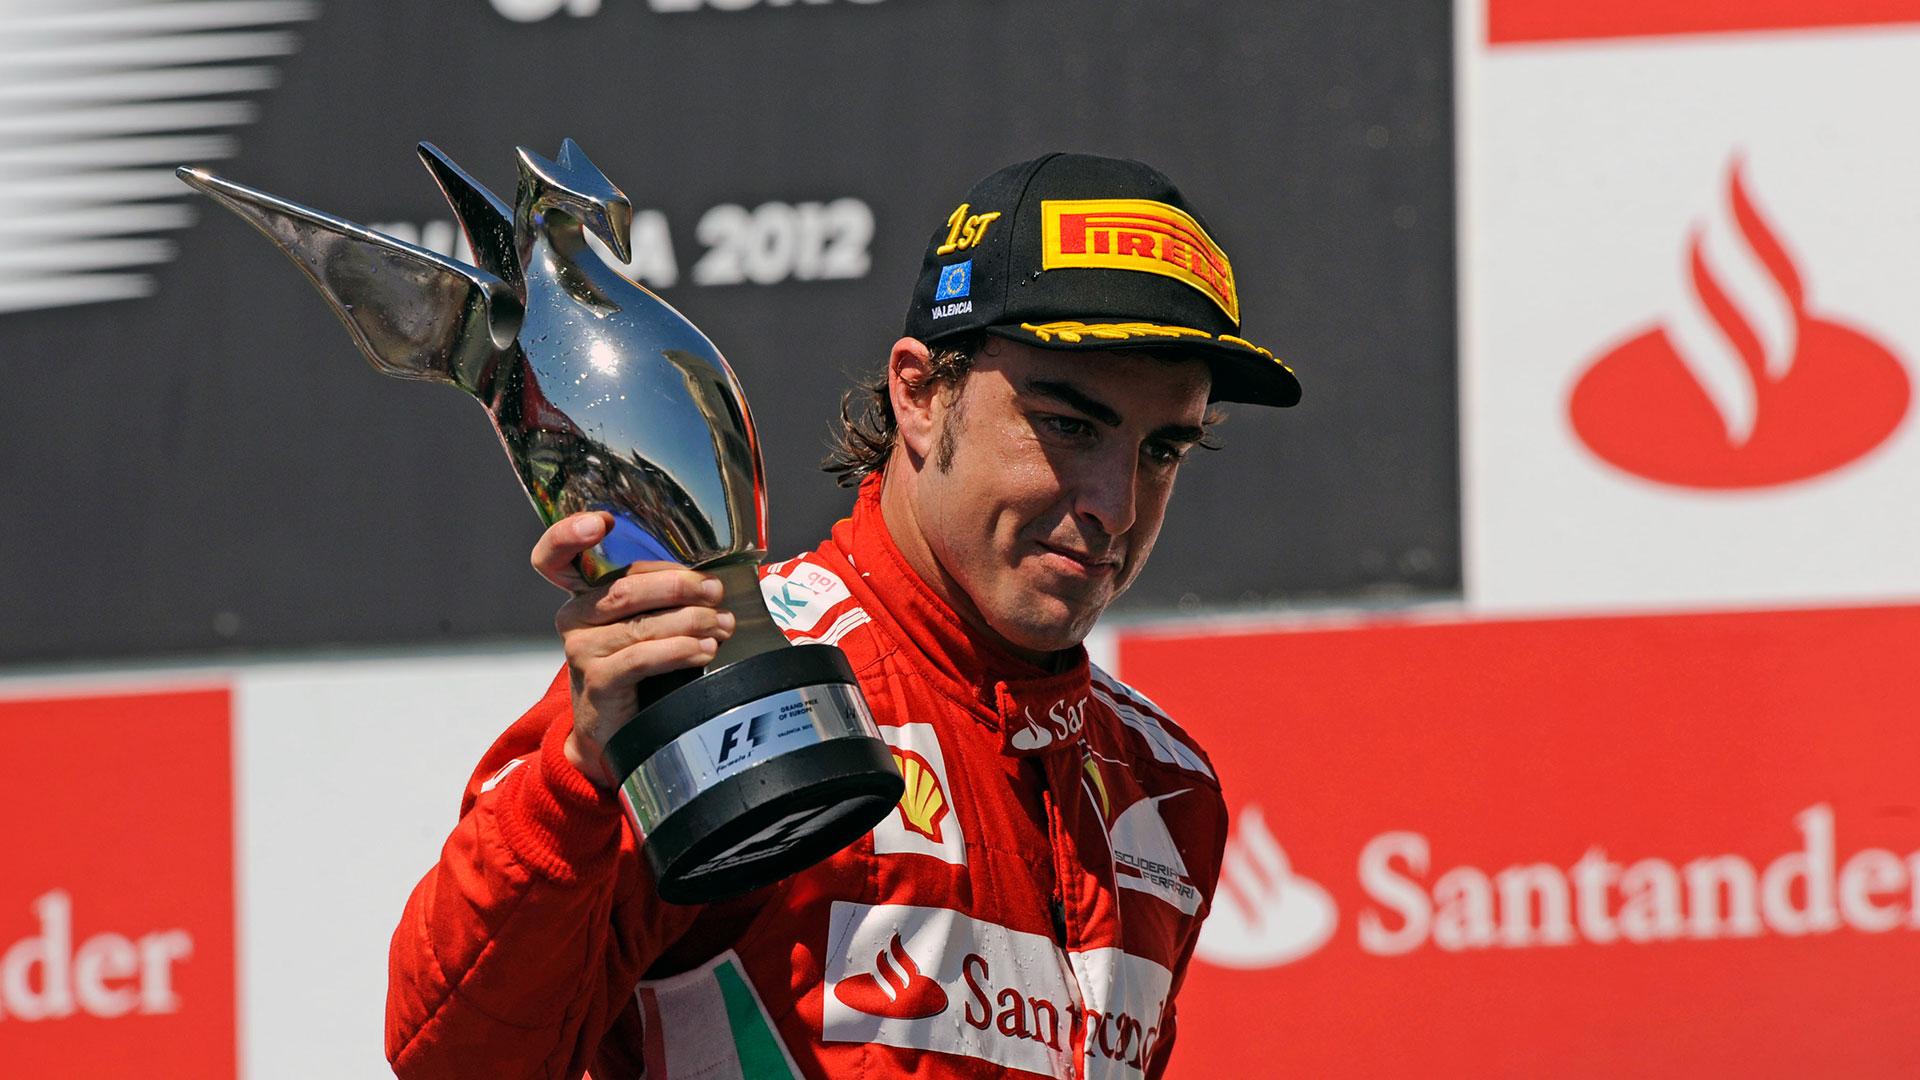 HD Wallpapers 2012 Formula 1 Grand Prix Of Europe